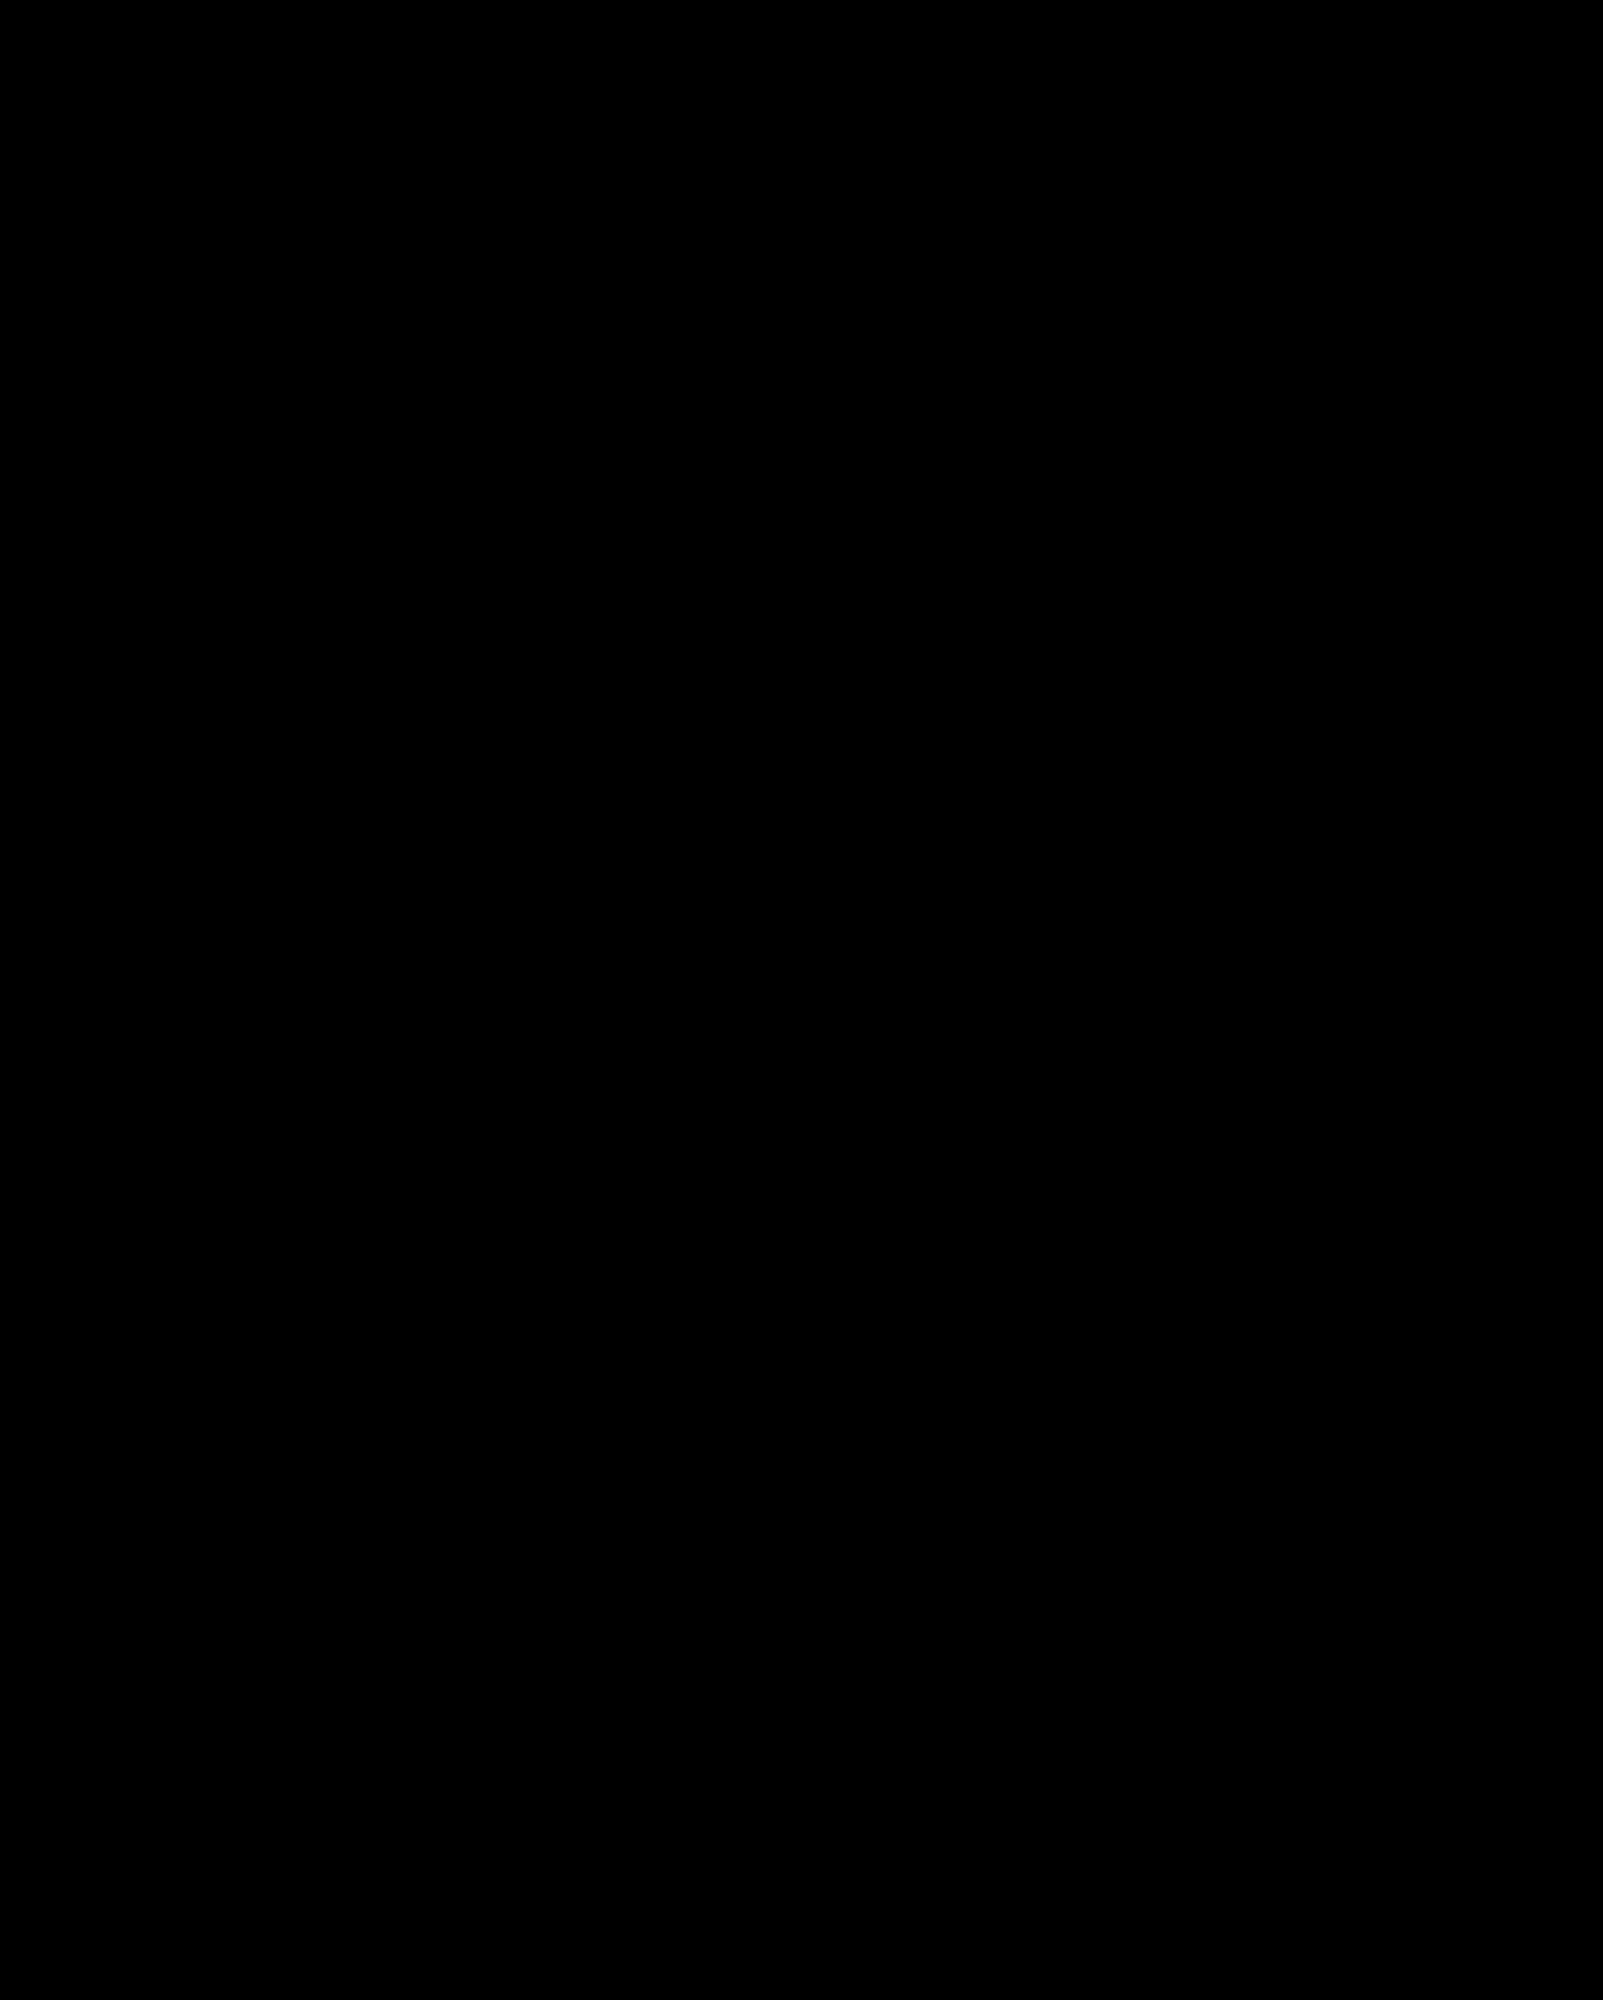 logo-black (2).png